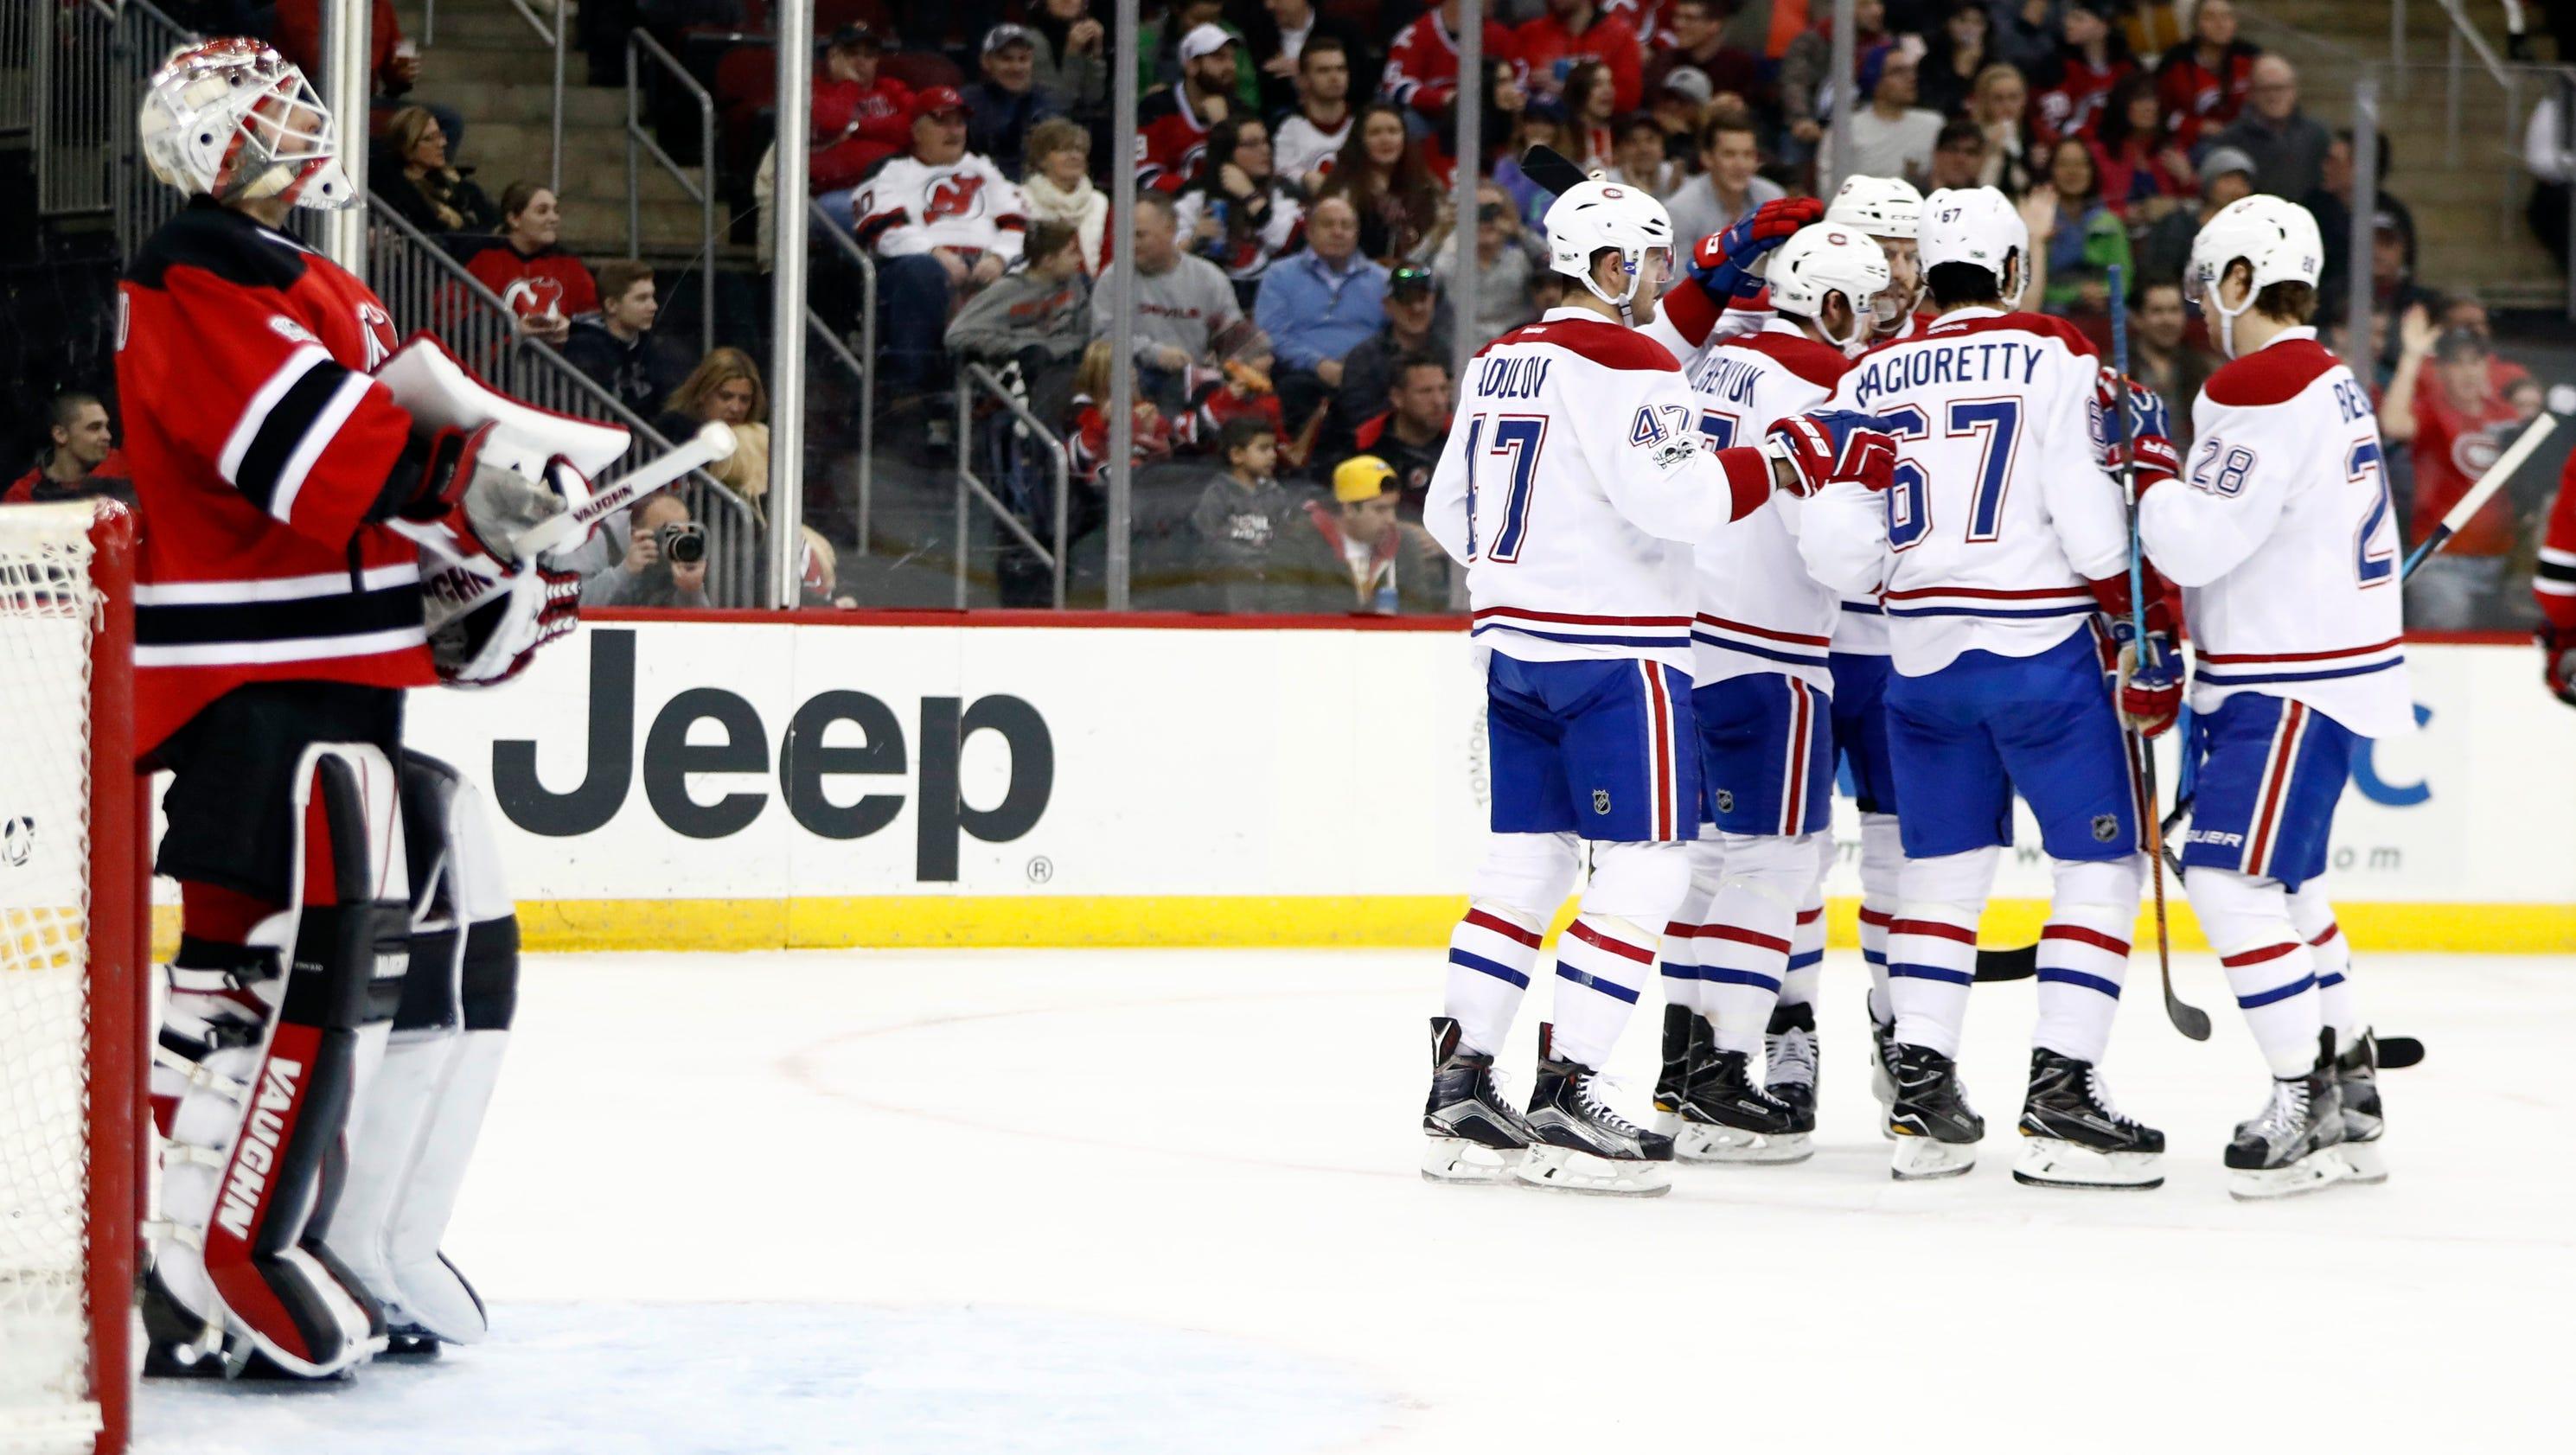 636205473134421040-canadiens-devils-hockey-14963049